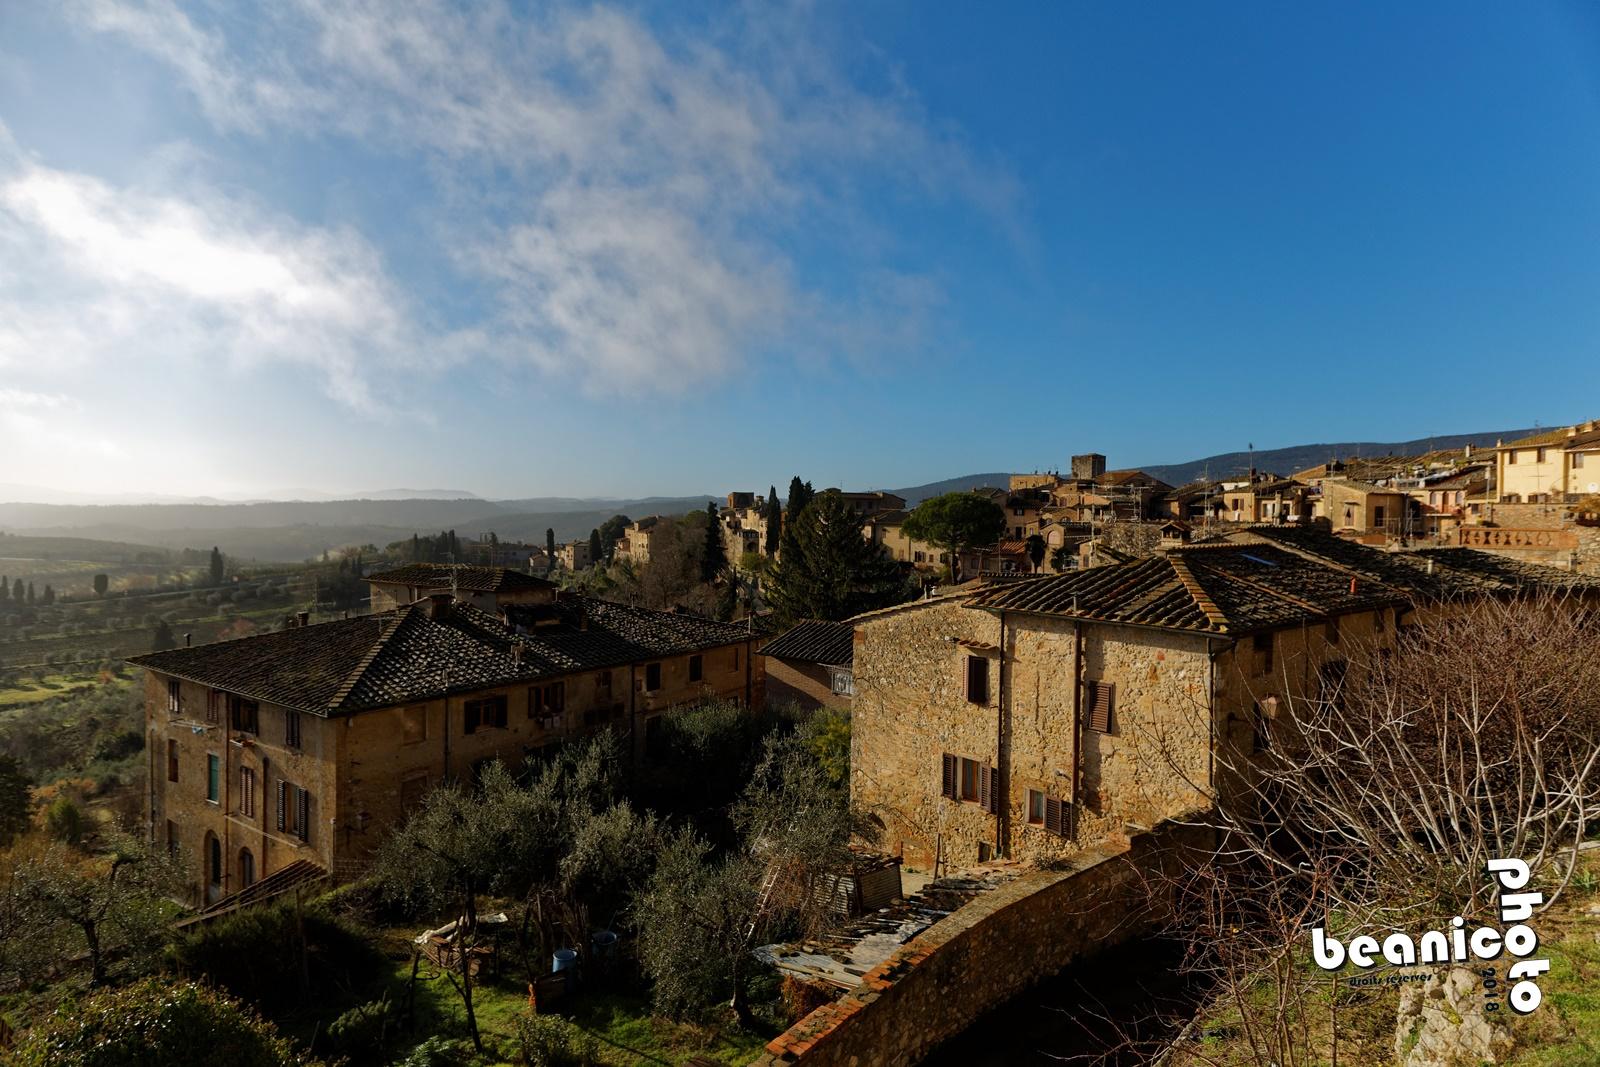 www.beanico-photo.fr - Canon 5DIII - Sigma Ex 20mm - f/4.0 1/1000 ISO100 - San Gemignano - Toscane